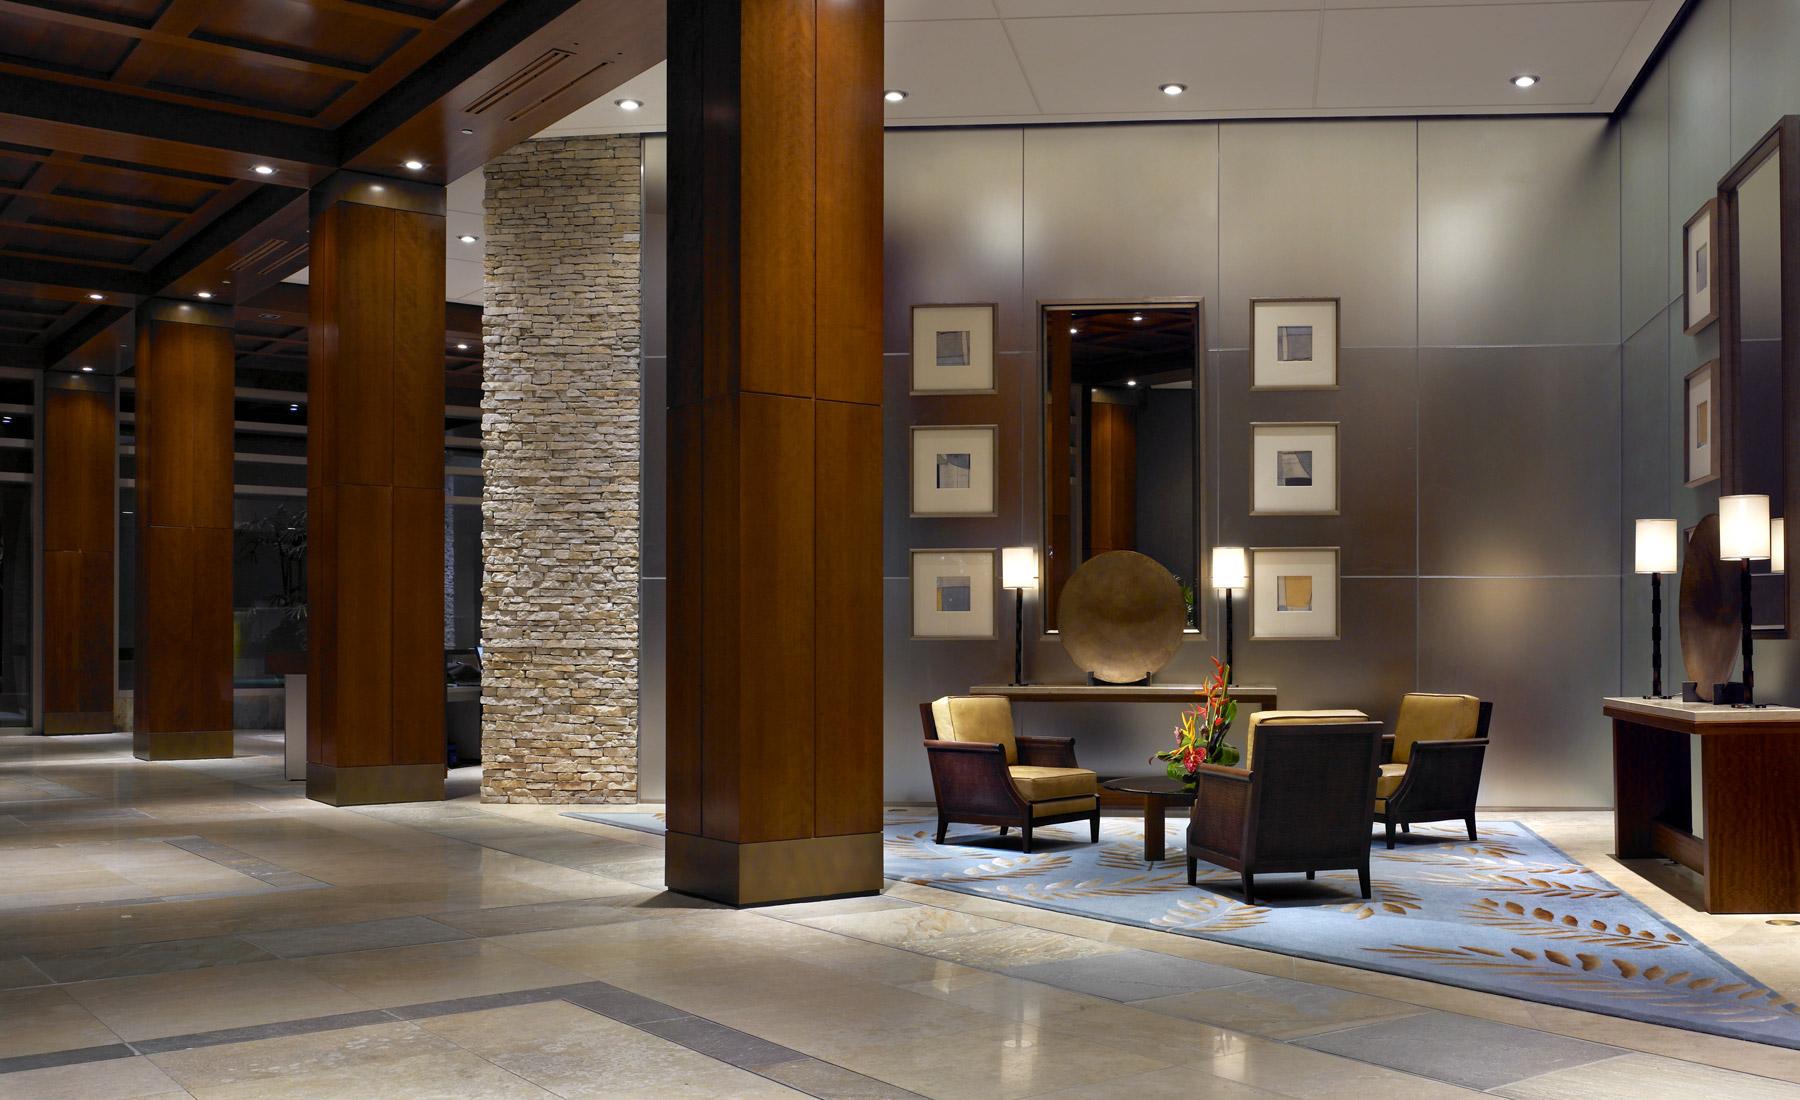 Hawaii Lobby & Spa